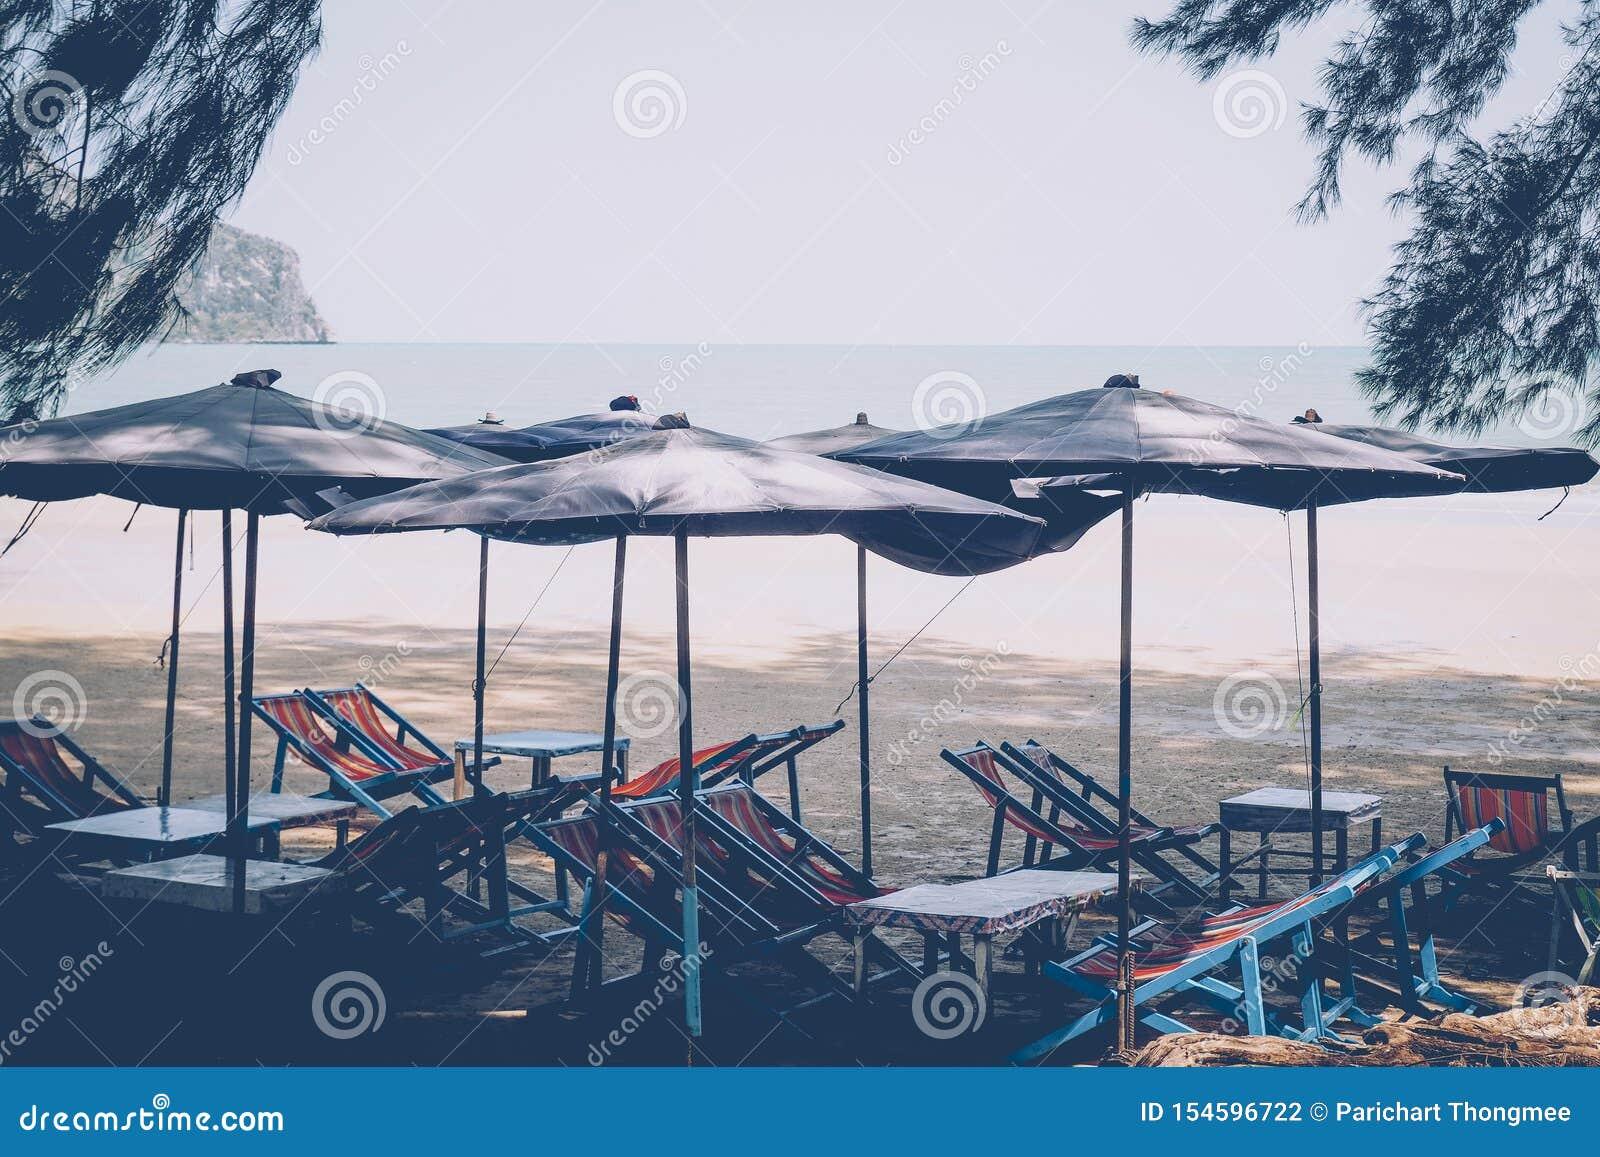 Sun umbrellas on a beach, with a view of a horizon line over the sea